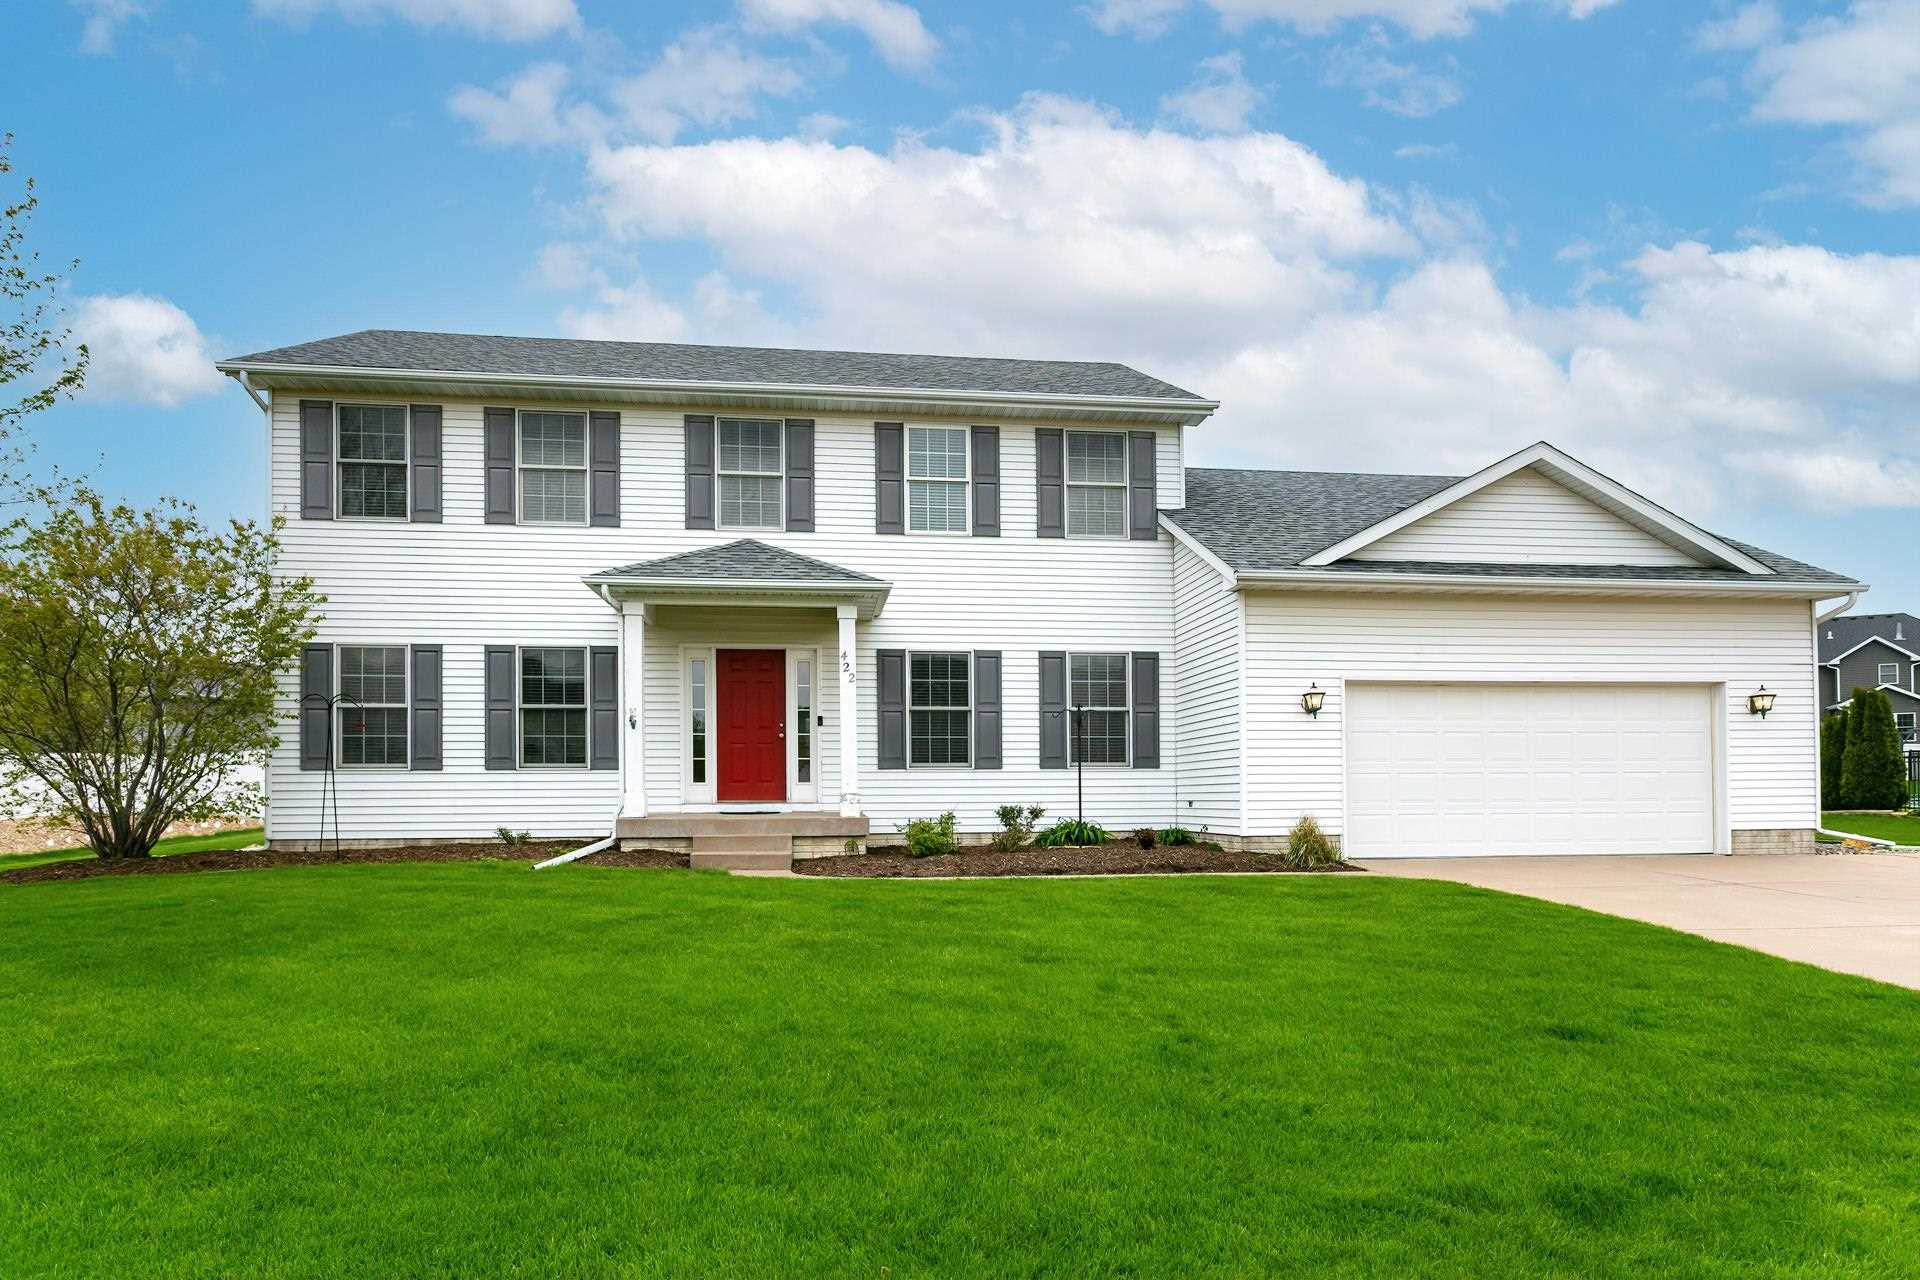 422 S TOMBERGS Property Photo - Eldridge, IA real estate listing